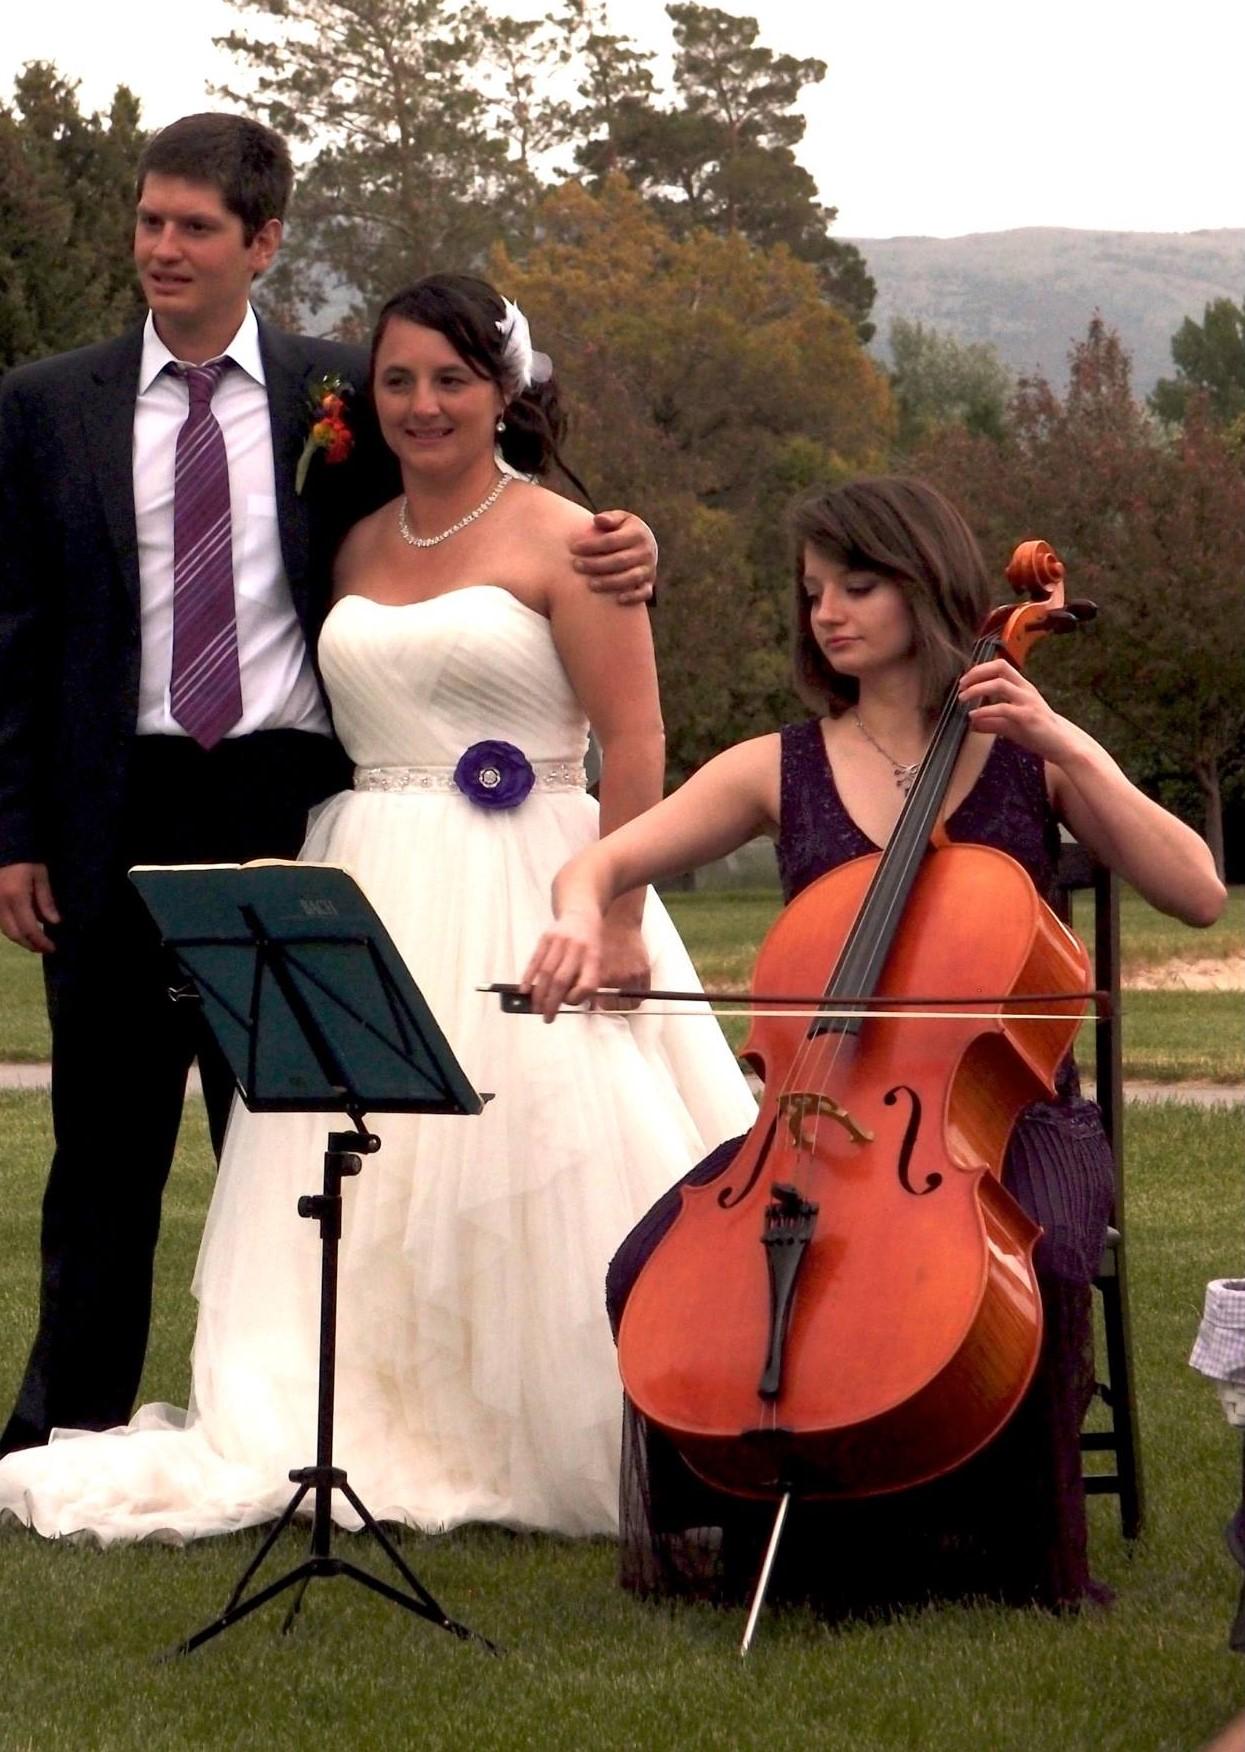 wedding jeb amber.JPG